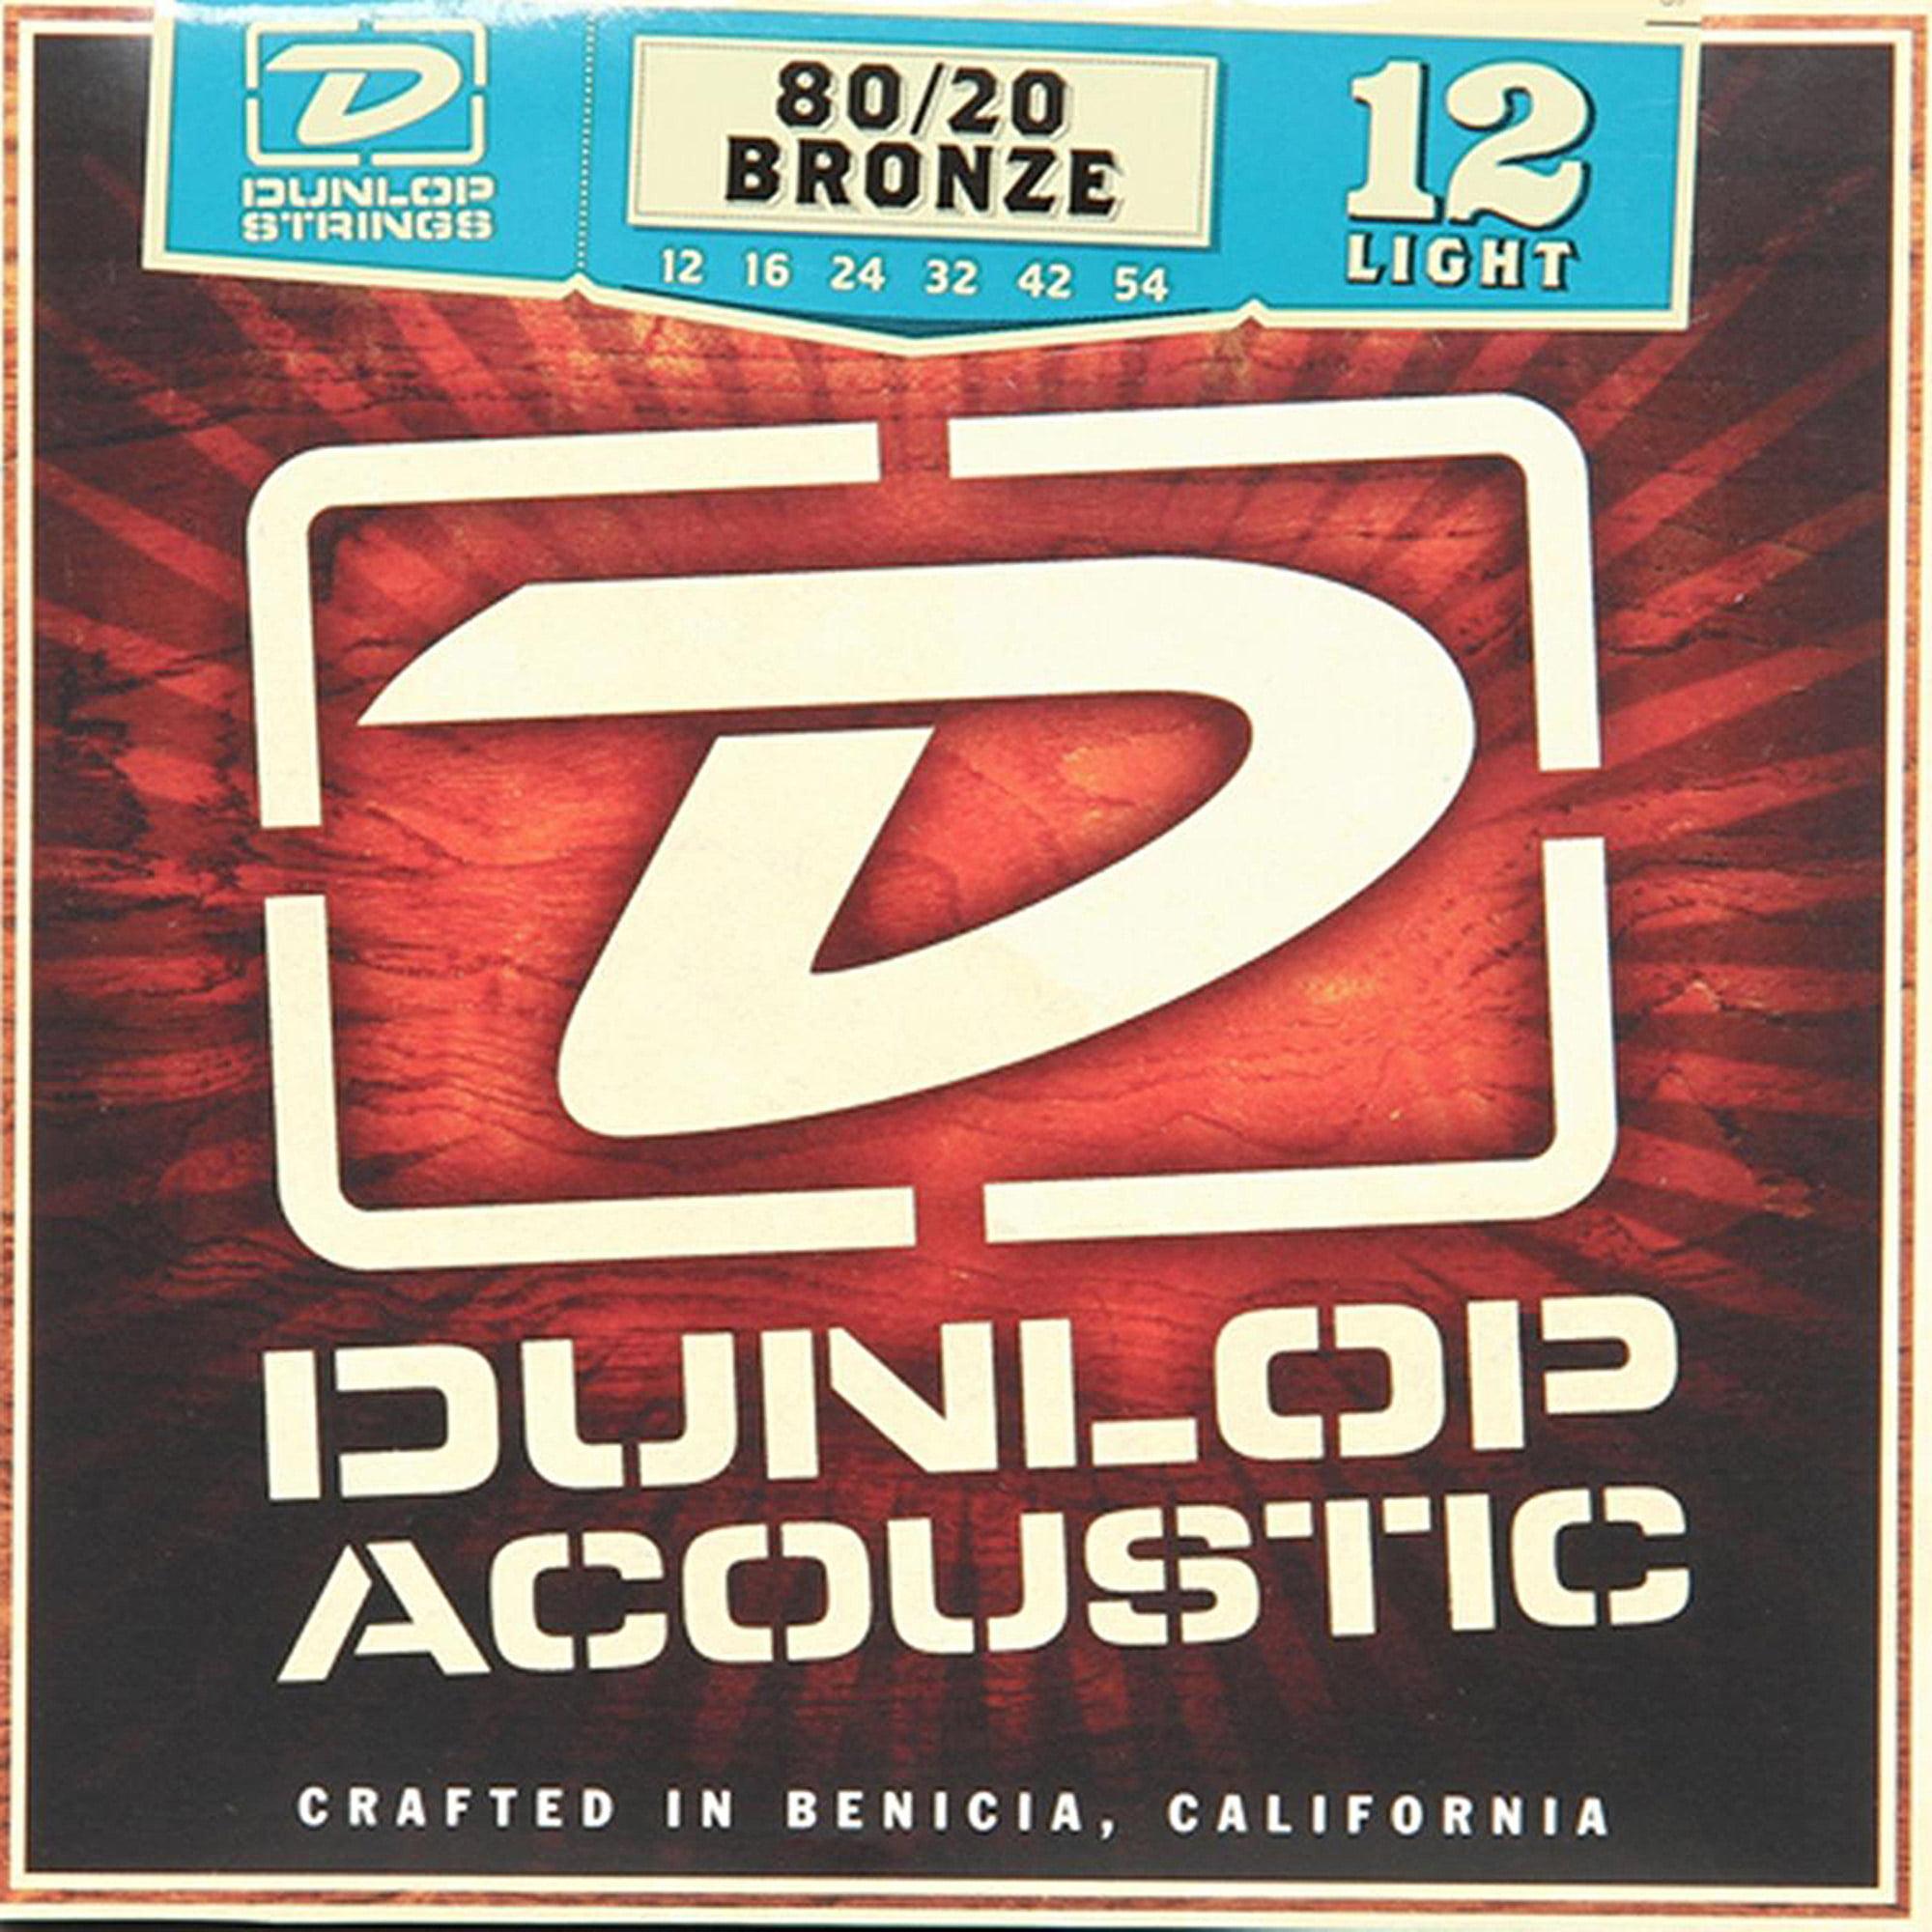 Dunlop DAB1254 80 20 Light Acoustic, 6-String Guitar Set, 012-.054 by Dunlop